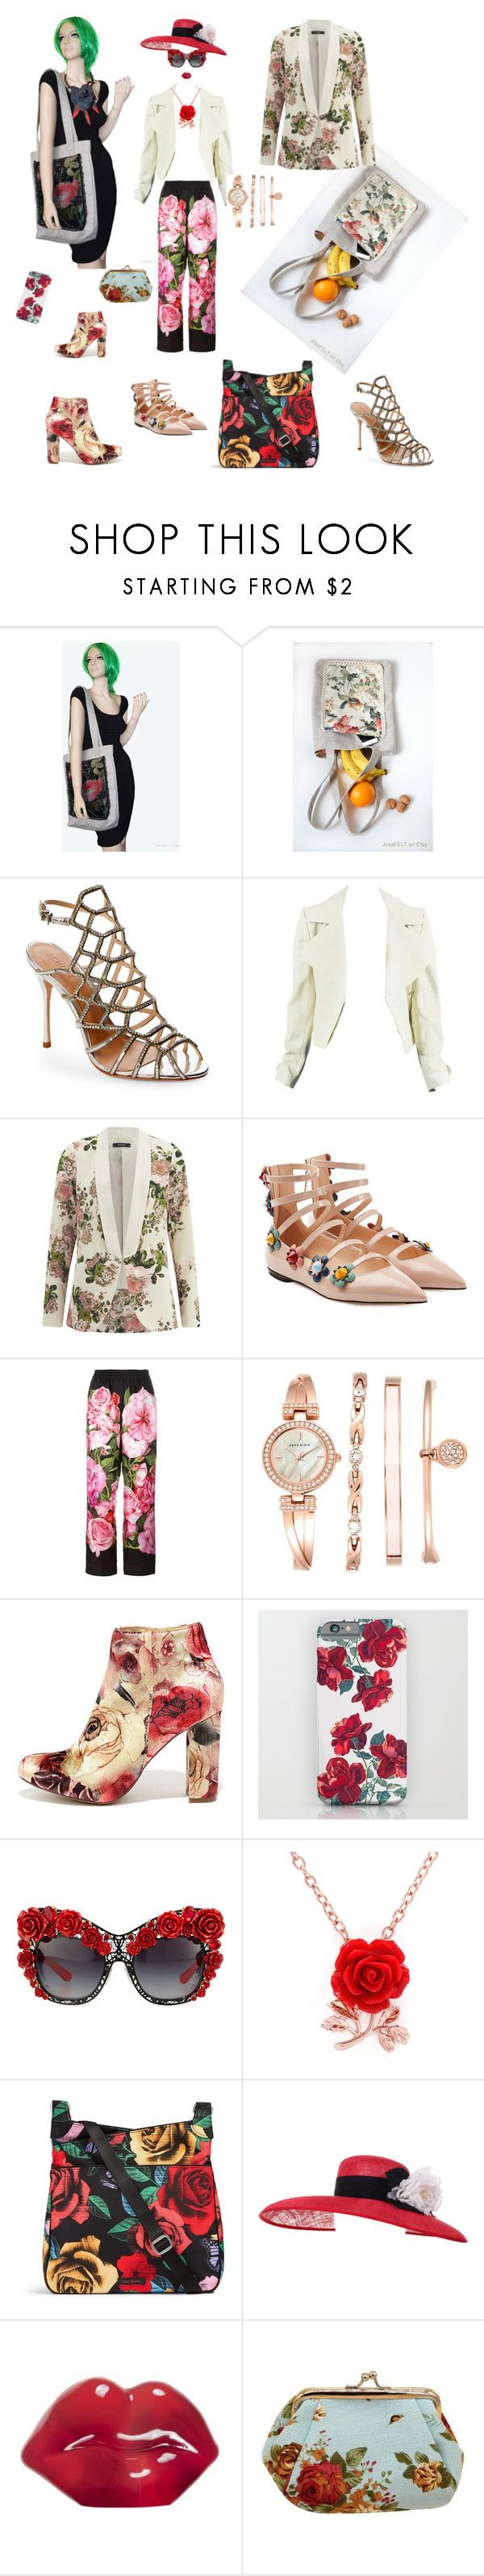 """Flowers in the fashion"" by recznedzielo-pl-jirsa-felt on Polyvore featuring moda, Schutz, VILA, Fendi, Dolce&Gabbana, Anne Klein, Liliana, Vera Bradley, Talitha i Kosta Boda"